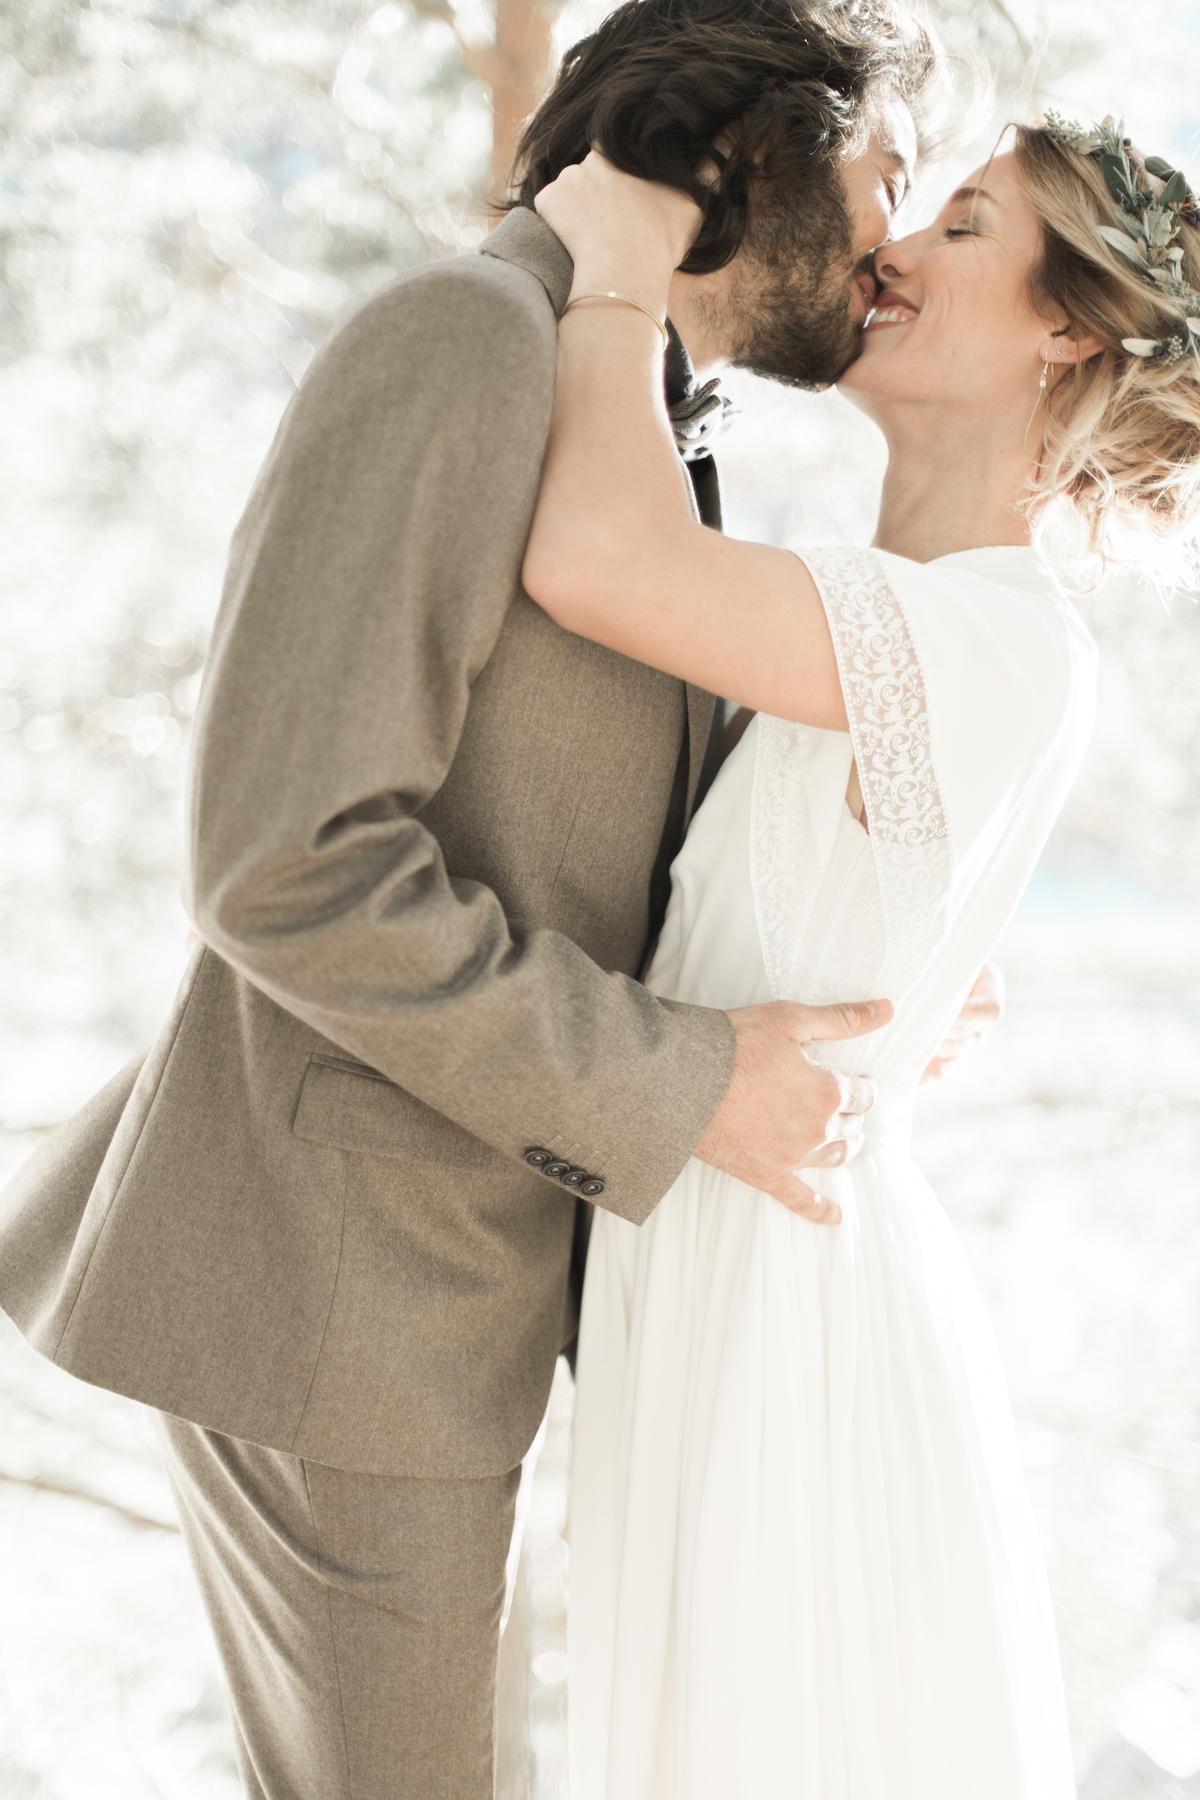 south-west-wedding-photographer-37.jpg